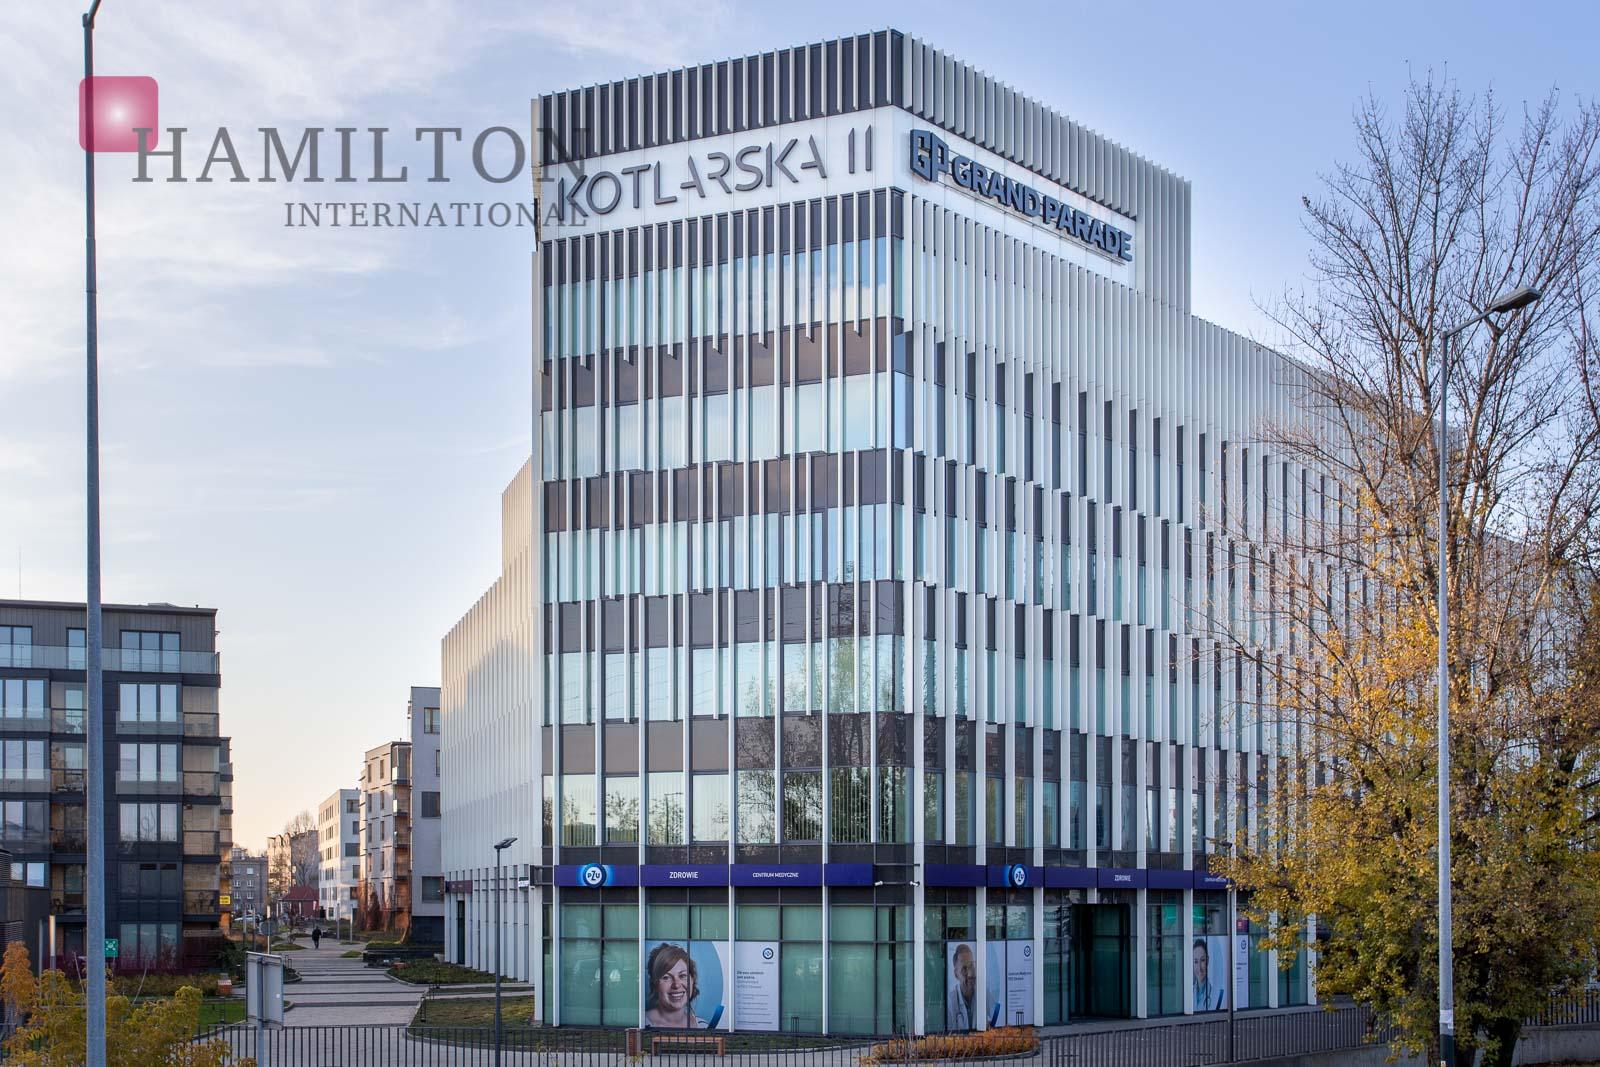 Kotlarska 11 Krakow office building photo